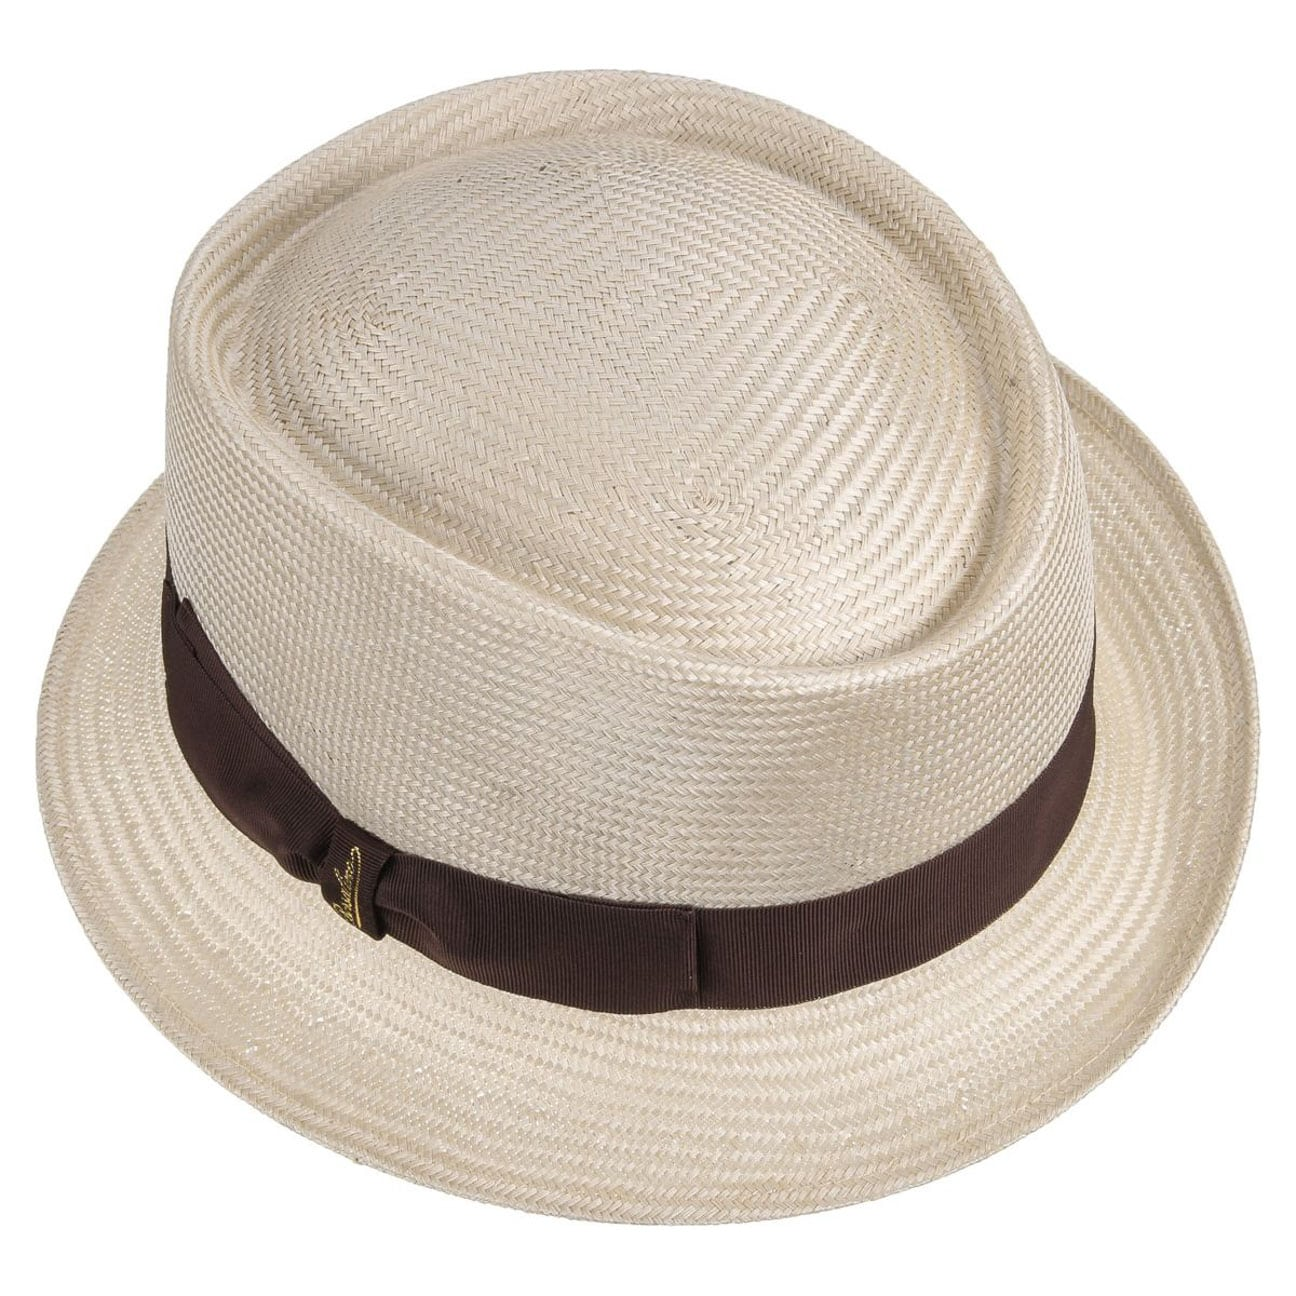 Cappello panama da donna borsalino natura jpg 1296x1296 Donna cappello  panama 5aaa2cd806ec